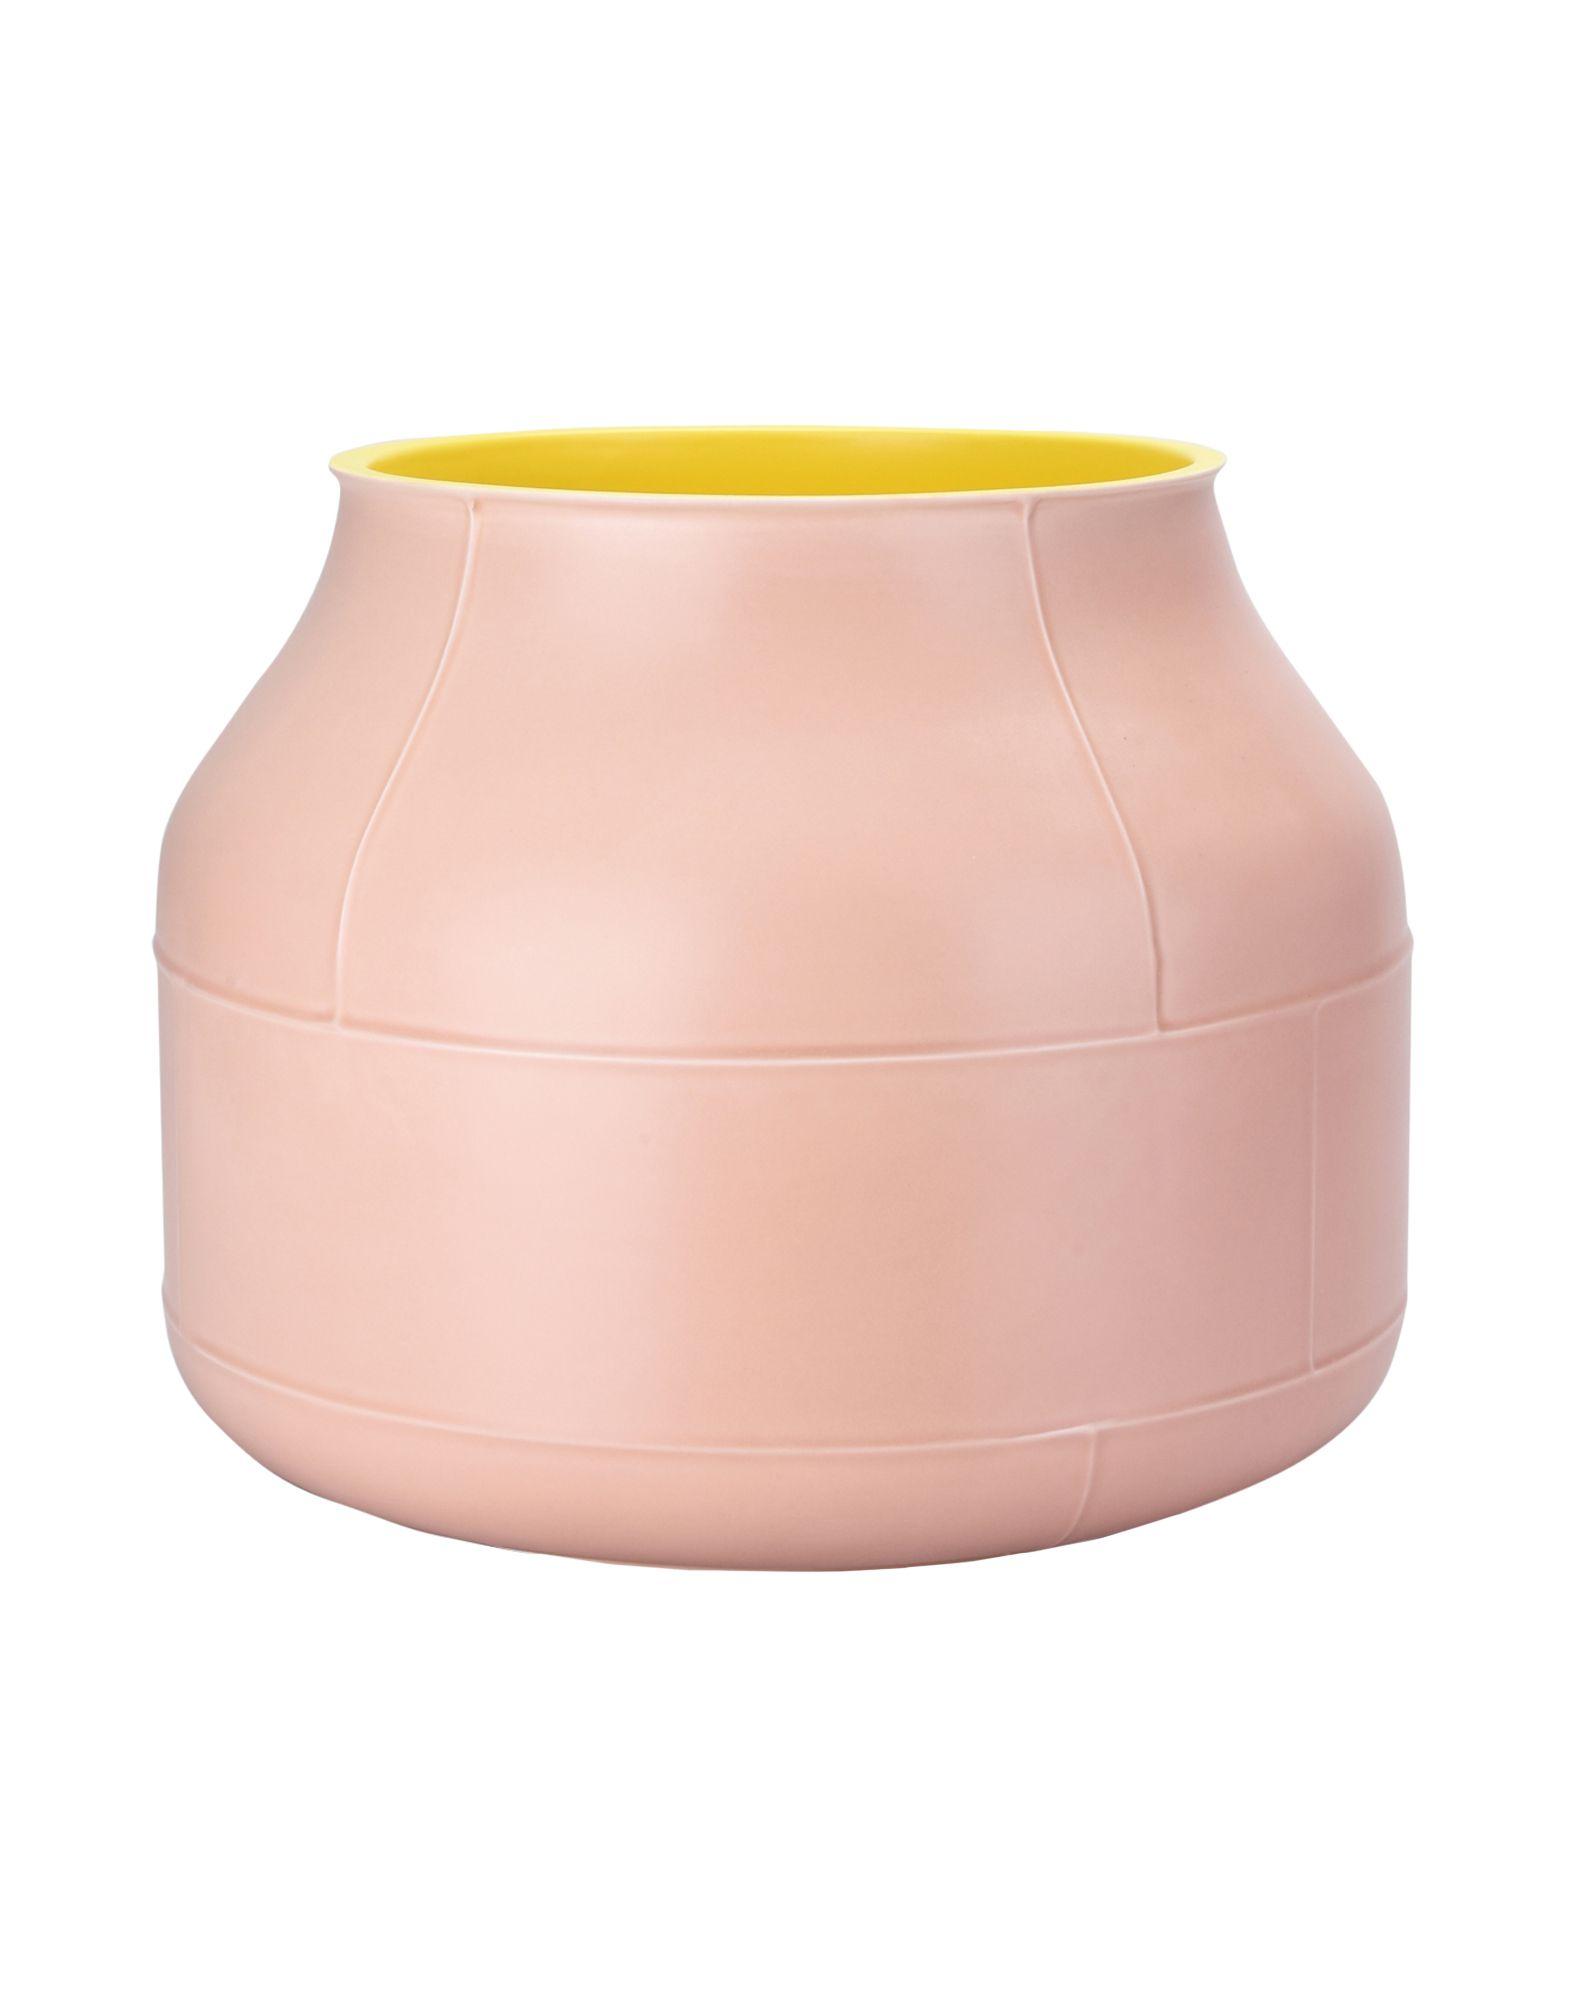 BITOSSI CERAMICHE Unisex Vase Farbe Rosa Größe 1